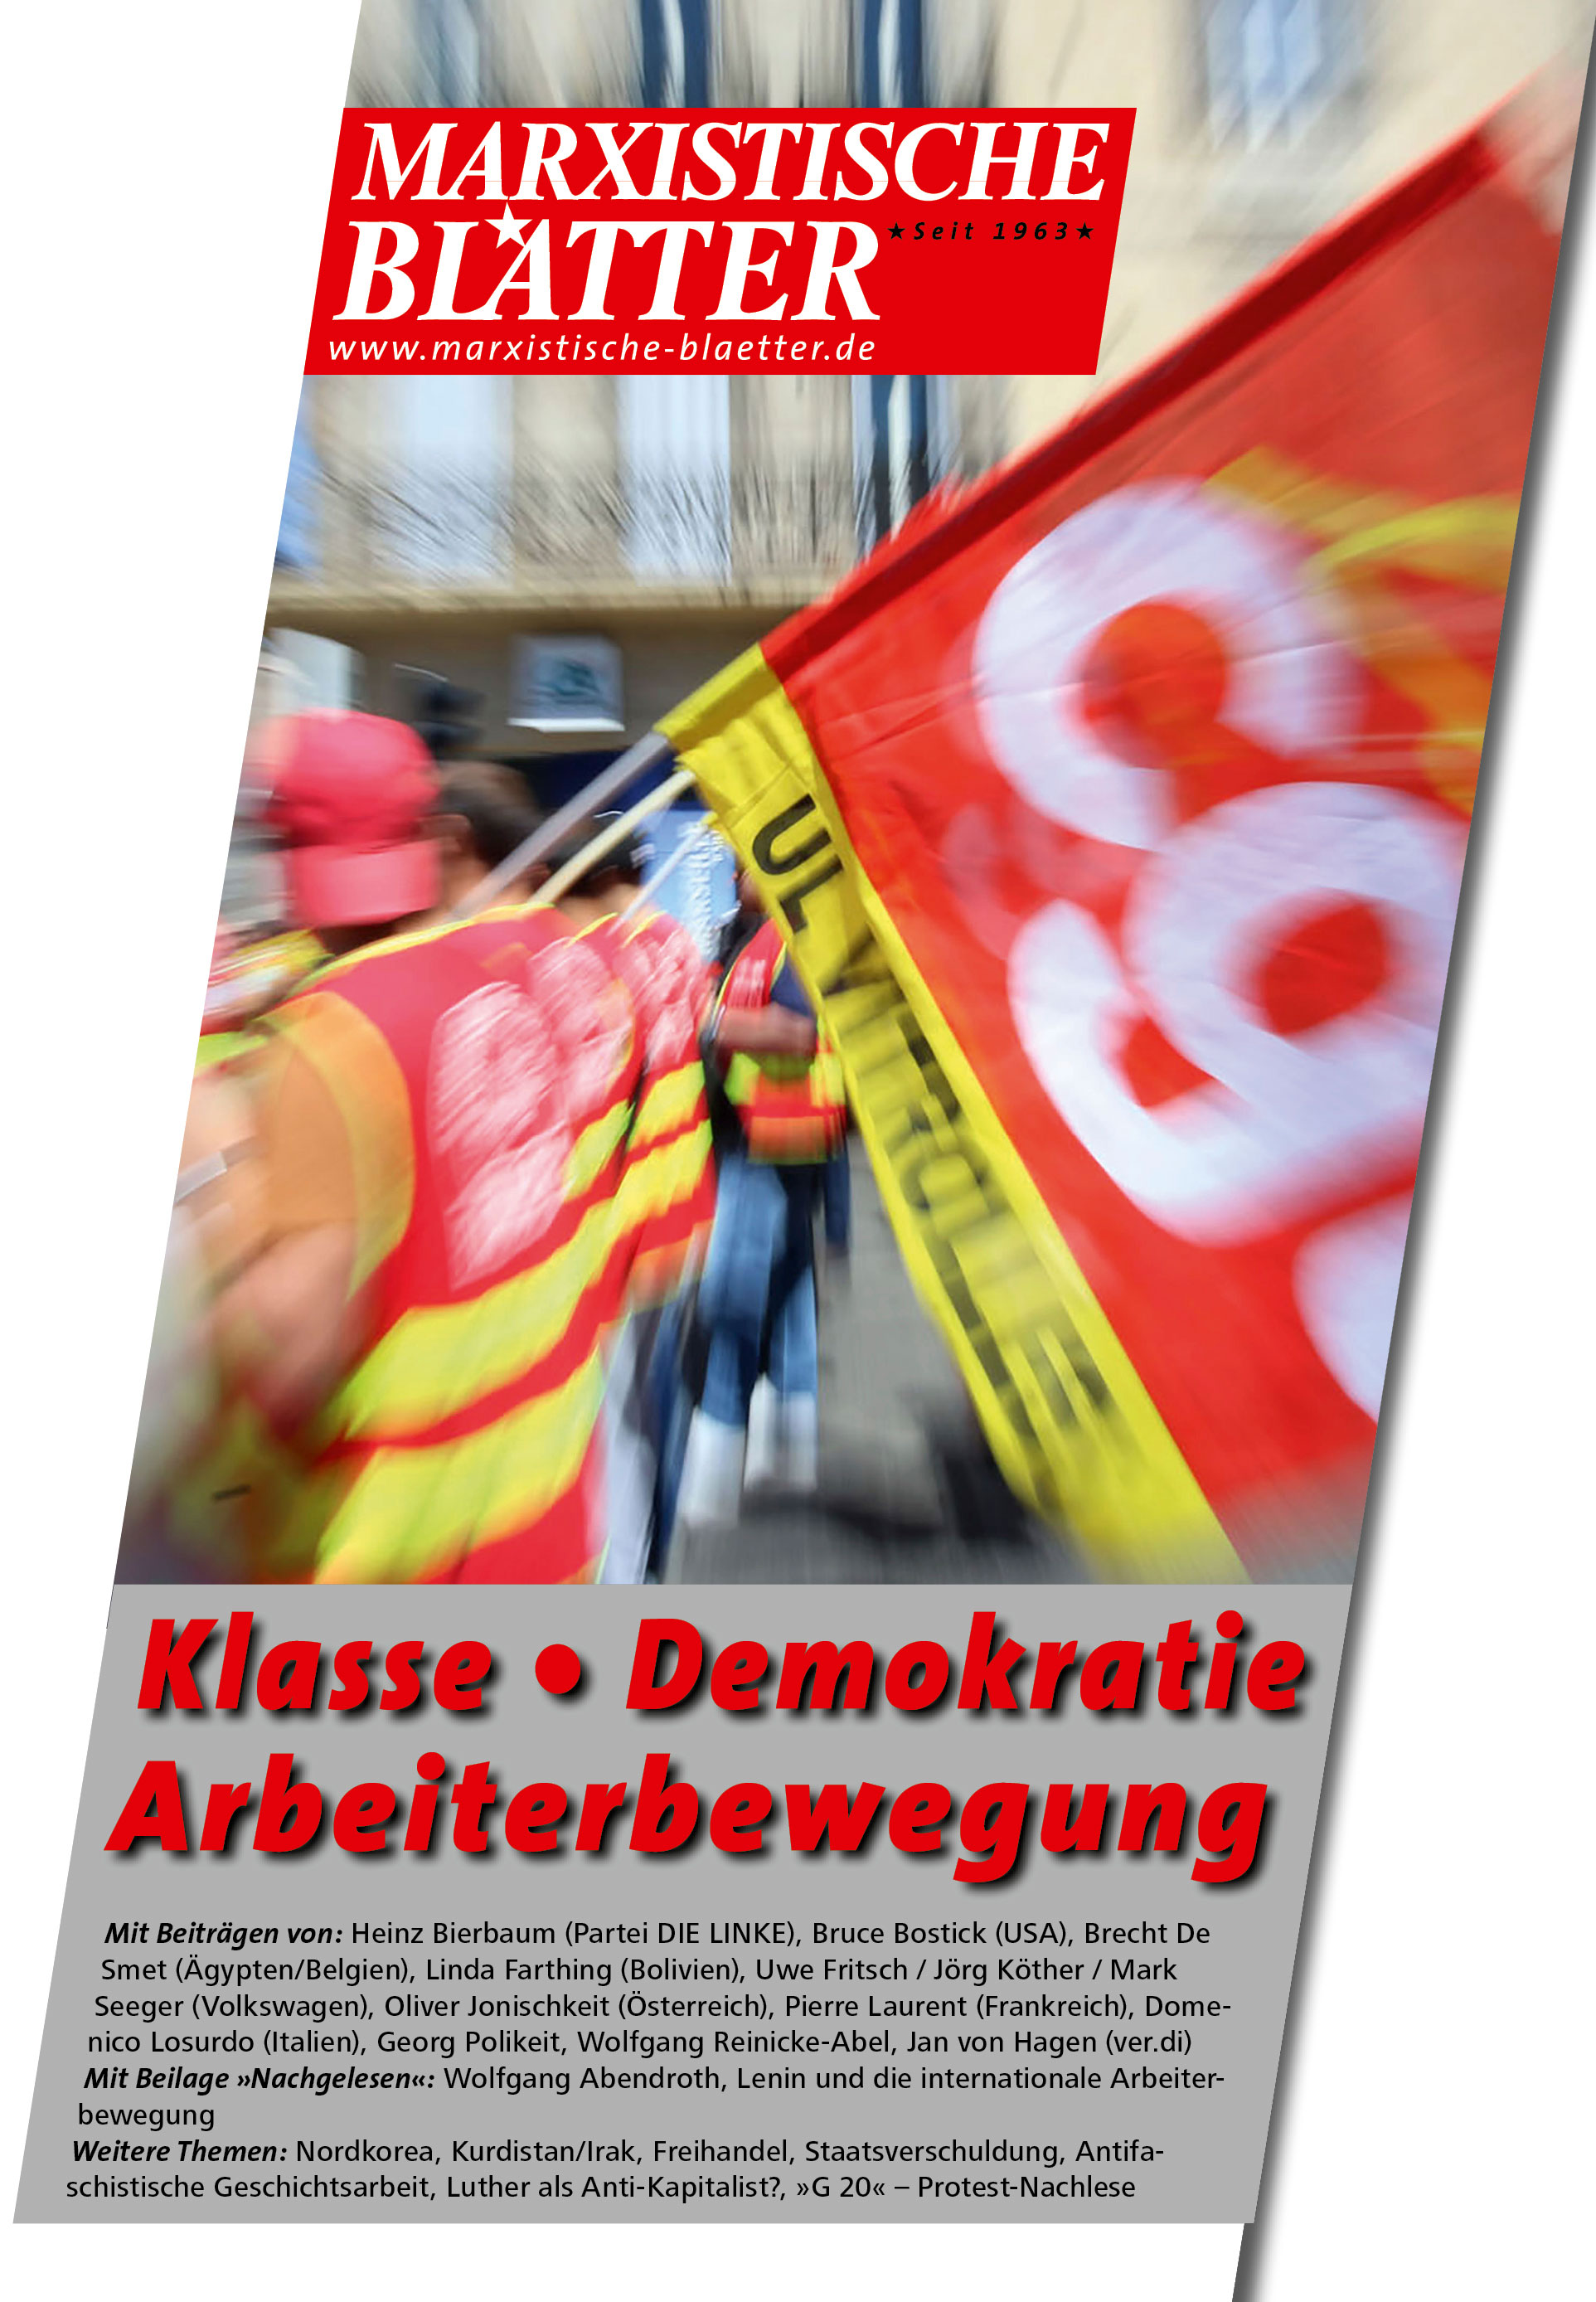 Klasse - Demokratie - Arbeiterbewegung